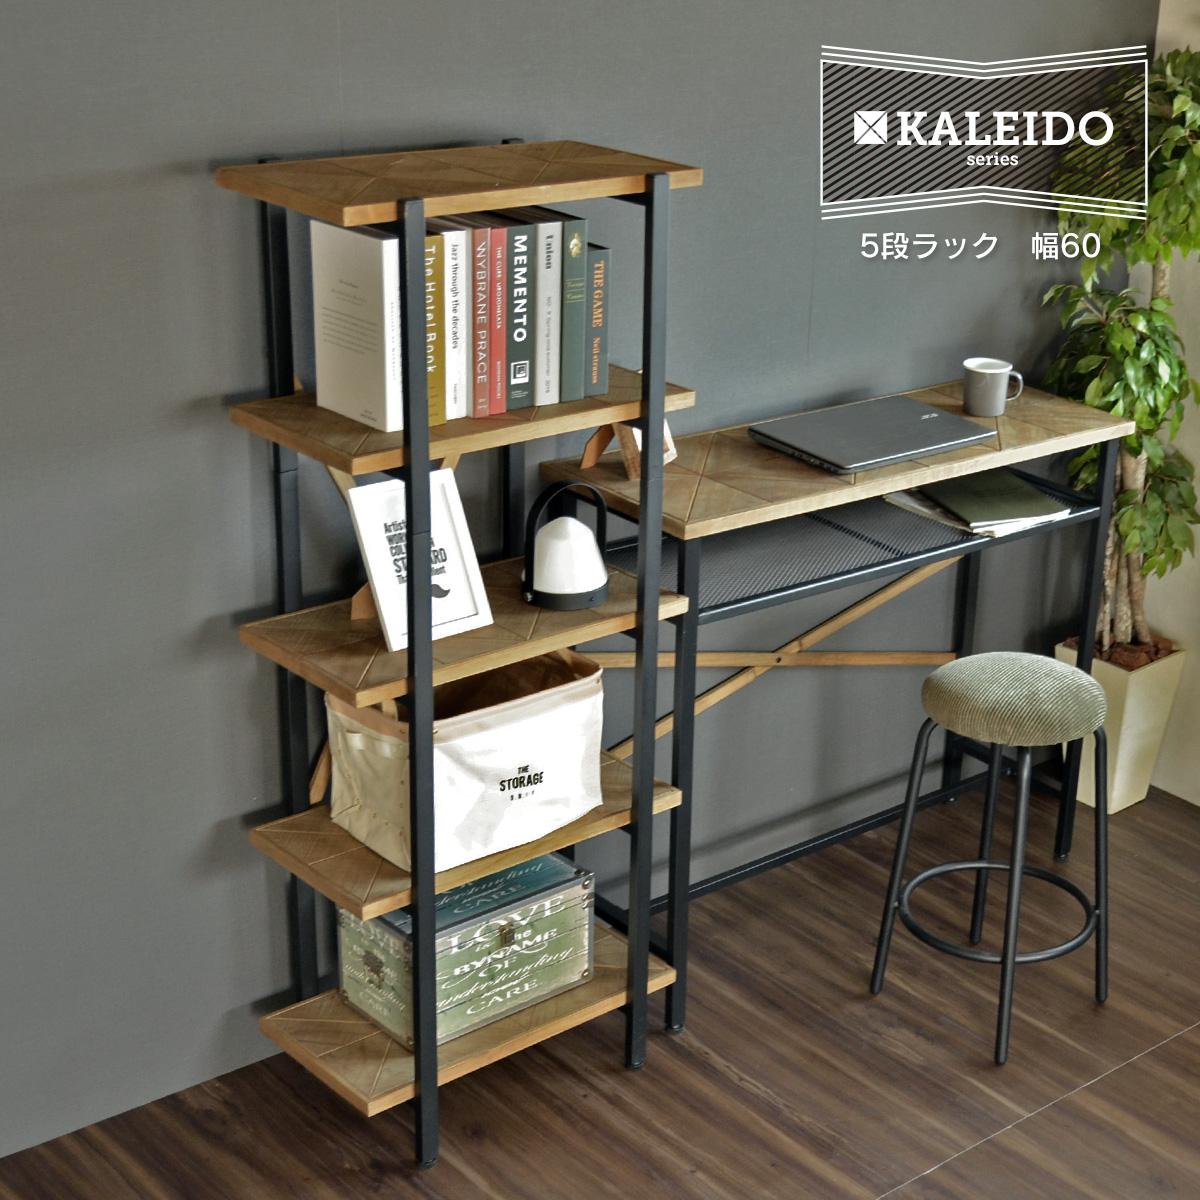 KALEIDO 5段ラック 幅60